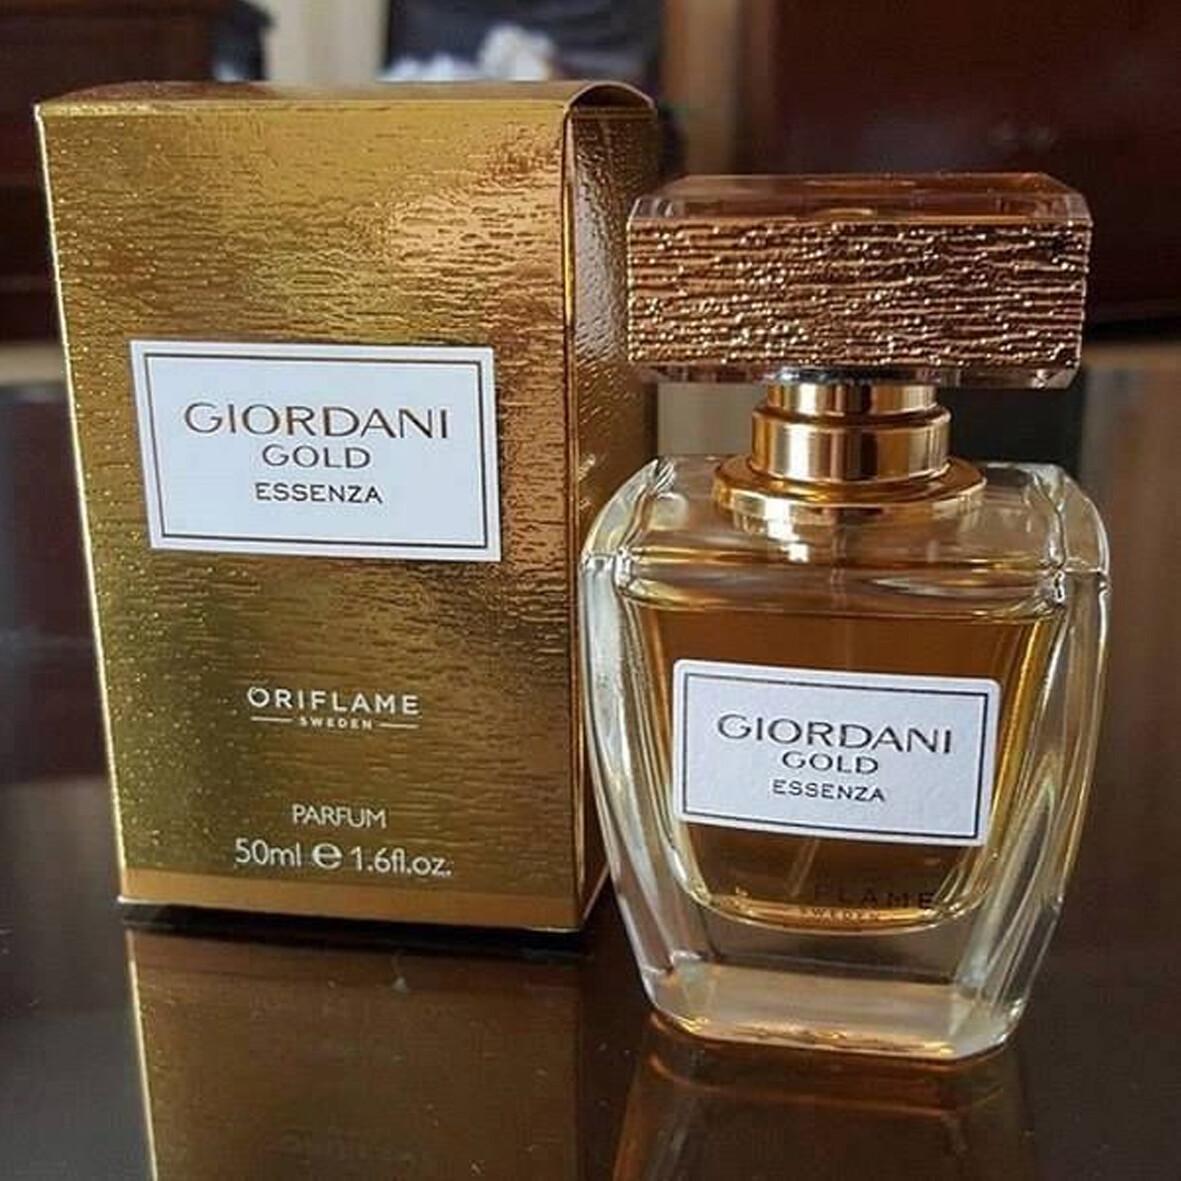 PERFUME DE MUJER MISS GIORDANI GOLD ESSENZA PARFUM - ORIFLAME